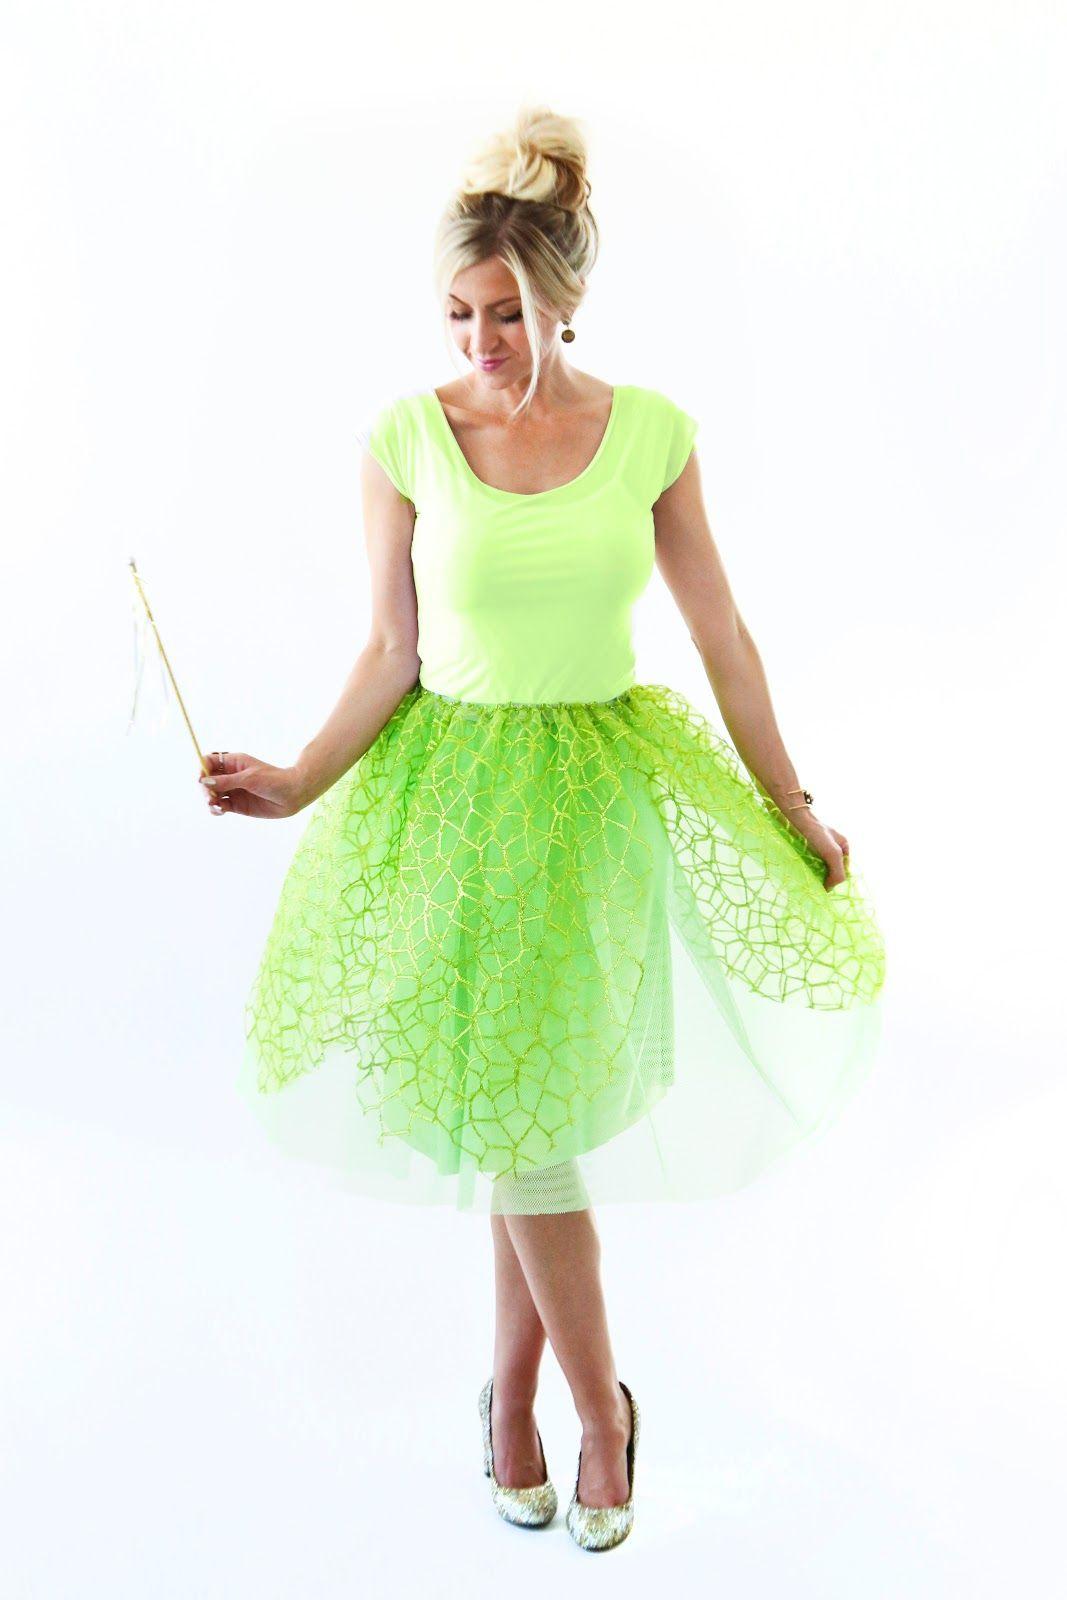 The Modern Girls Halloween Week Tinkerbell Costume Elle Apparel By Leanne Barlow Tinker Bell Costume Diy Tinkerbell Costume Halloween Girl [ 1600 x 1067 Pixel ]